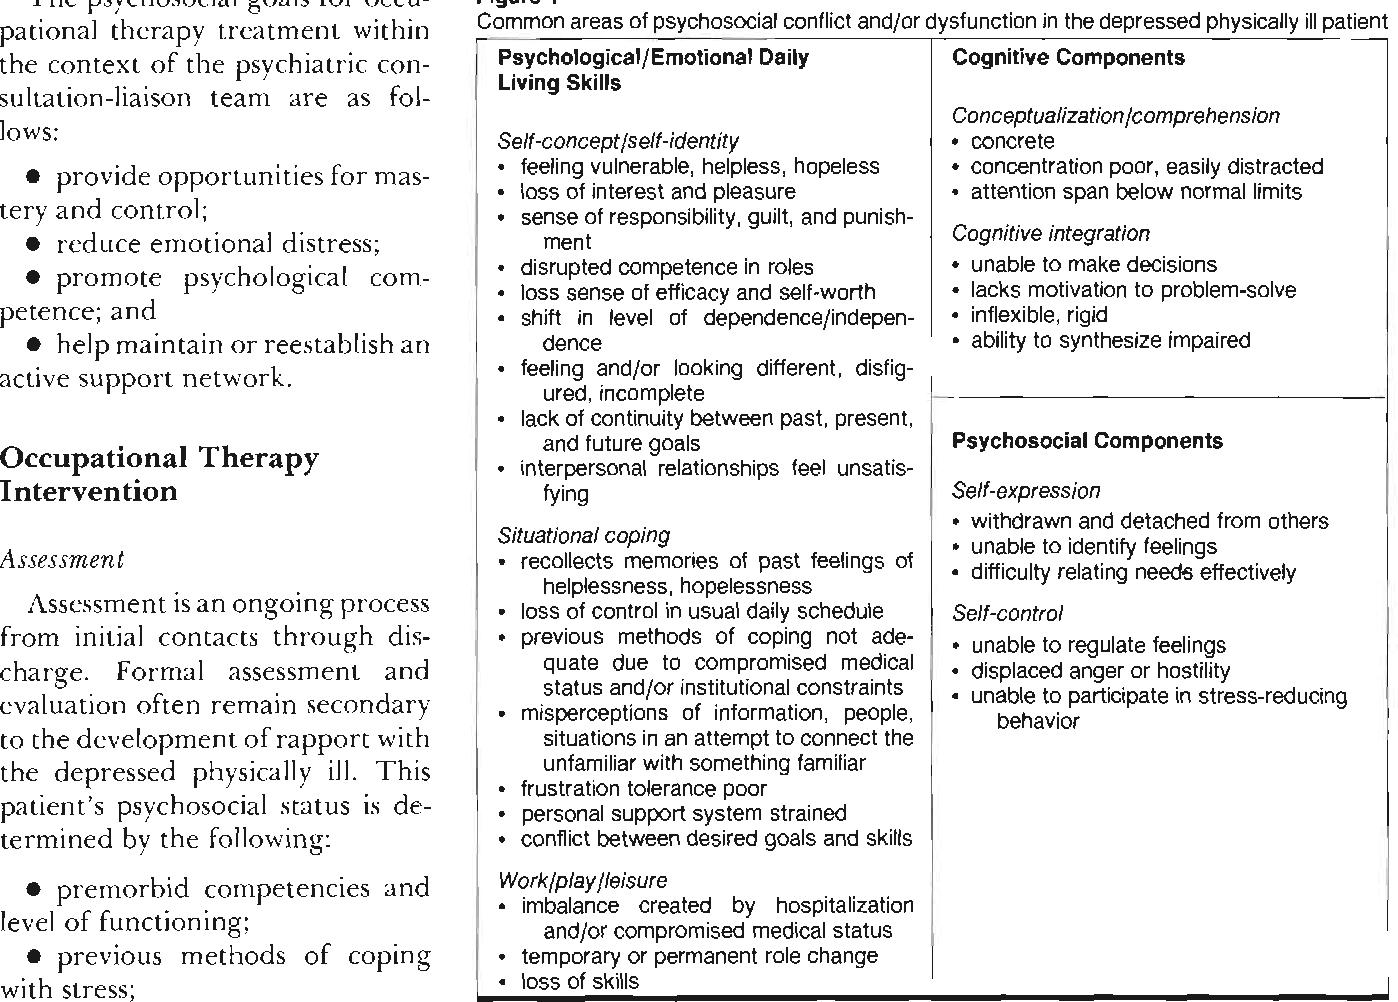 Pdf Psychiatric Consultation Liaison In The Acute Physical Disabilities Setting Semantic Scholar